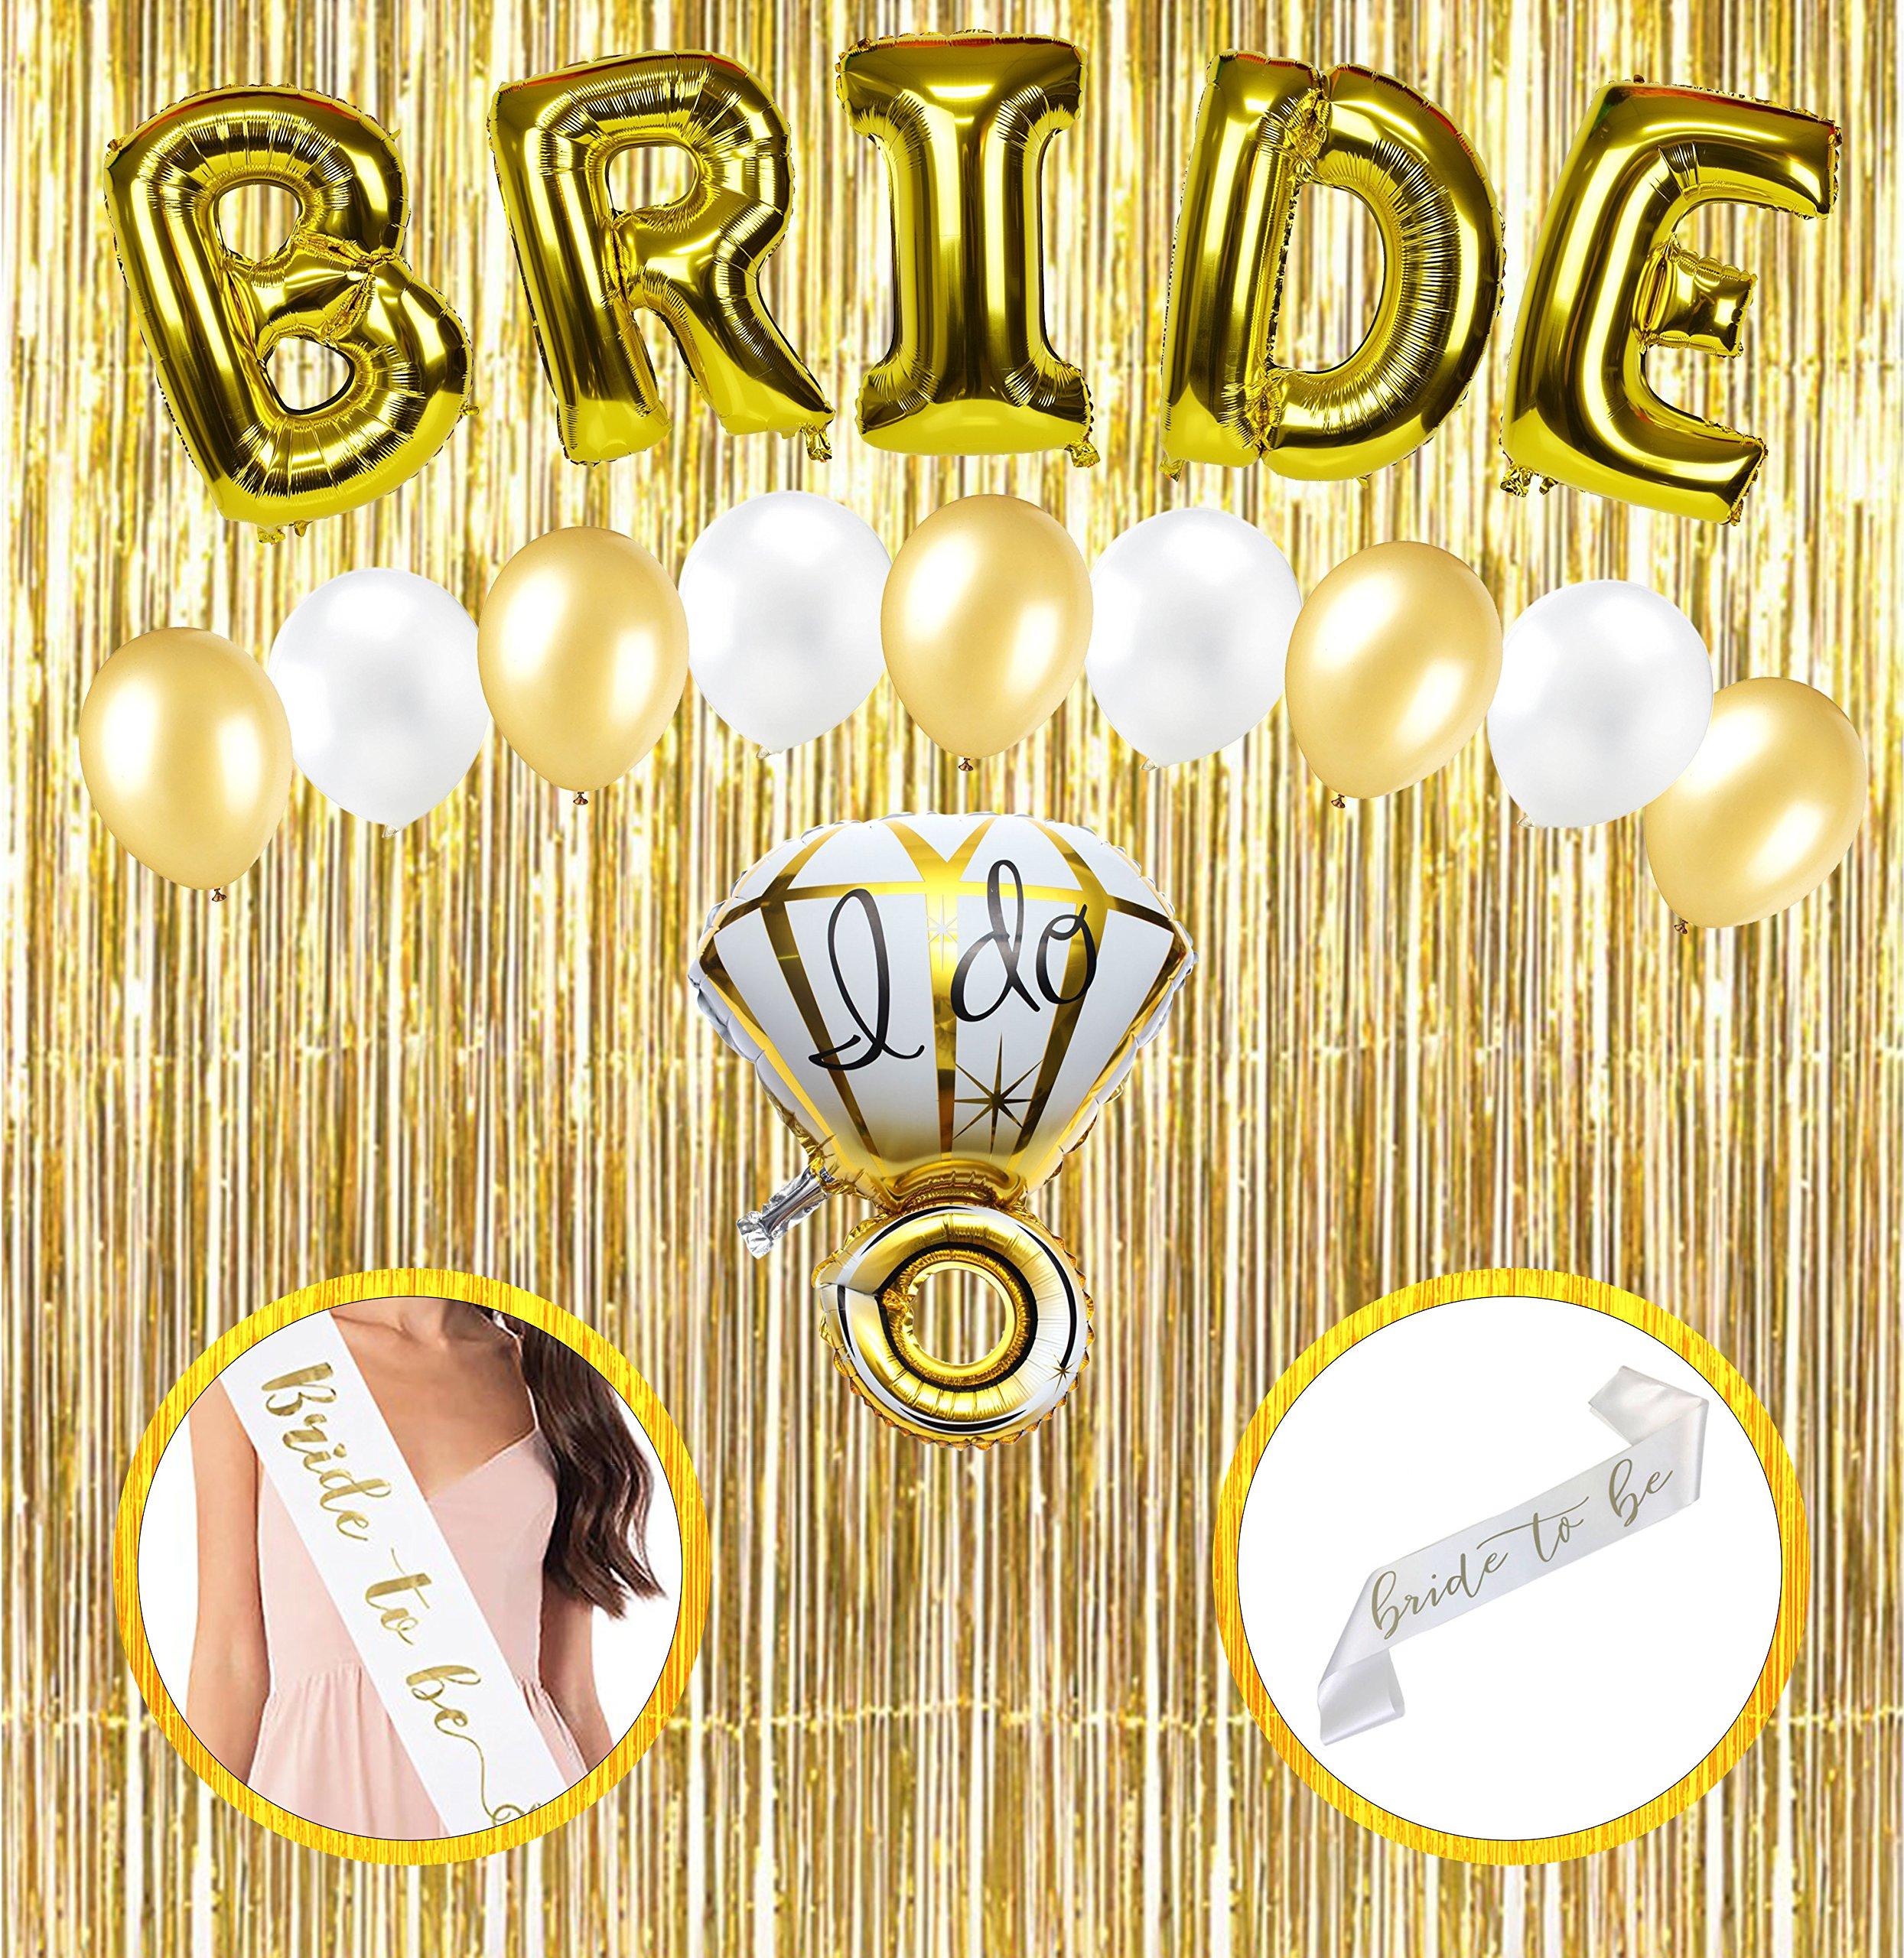 bachelorette party decorations bridal shower kit includes gold foil diamond ring and bride foil balloons